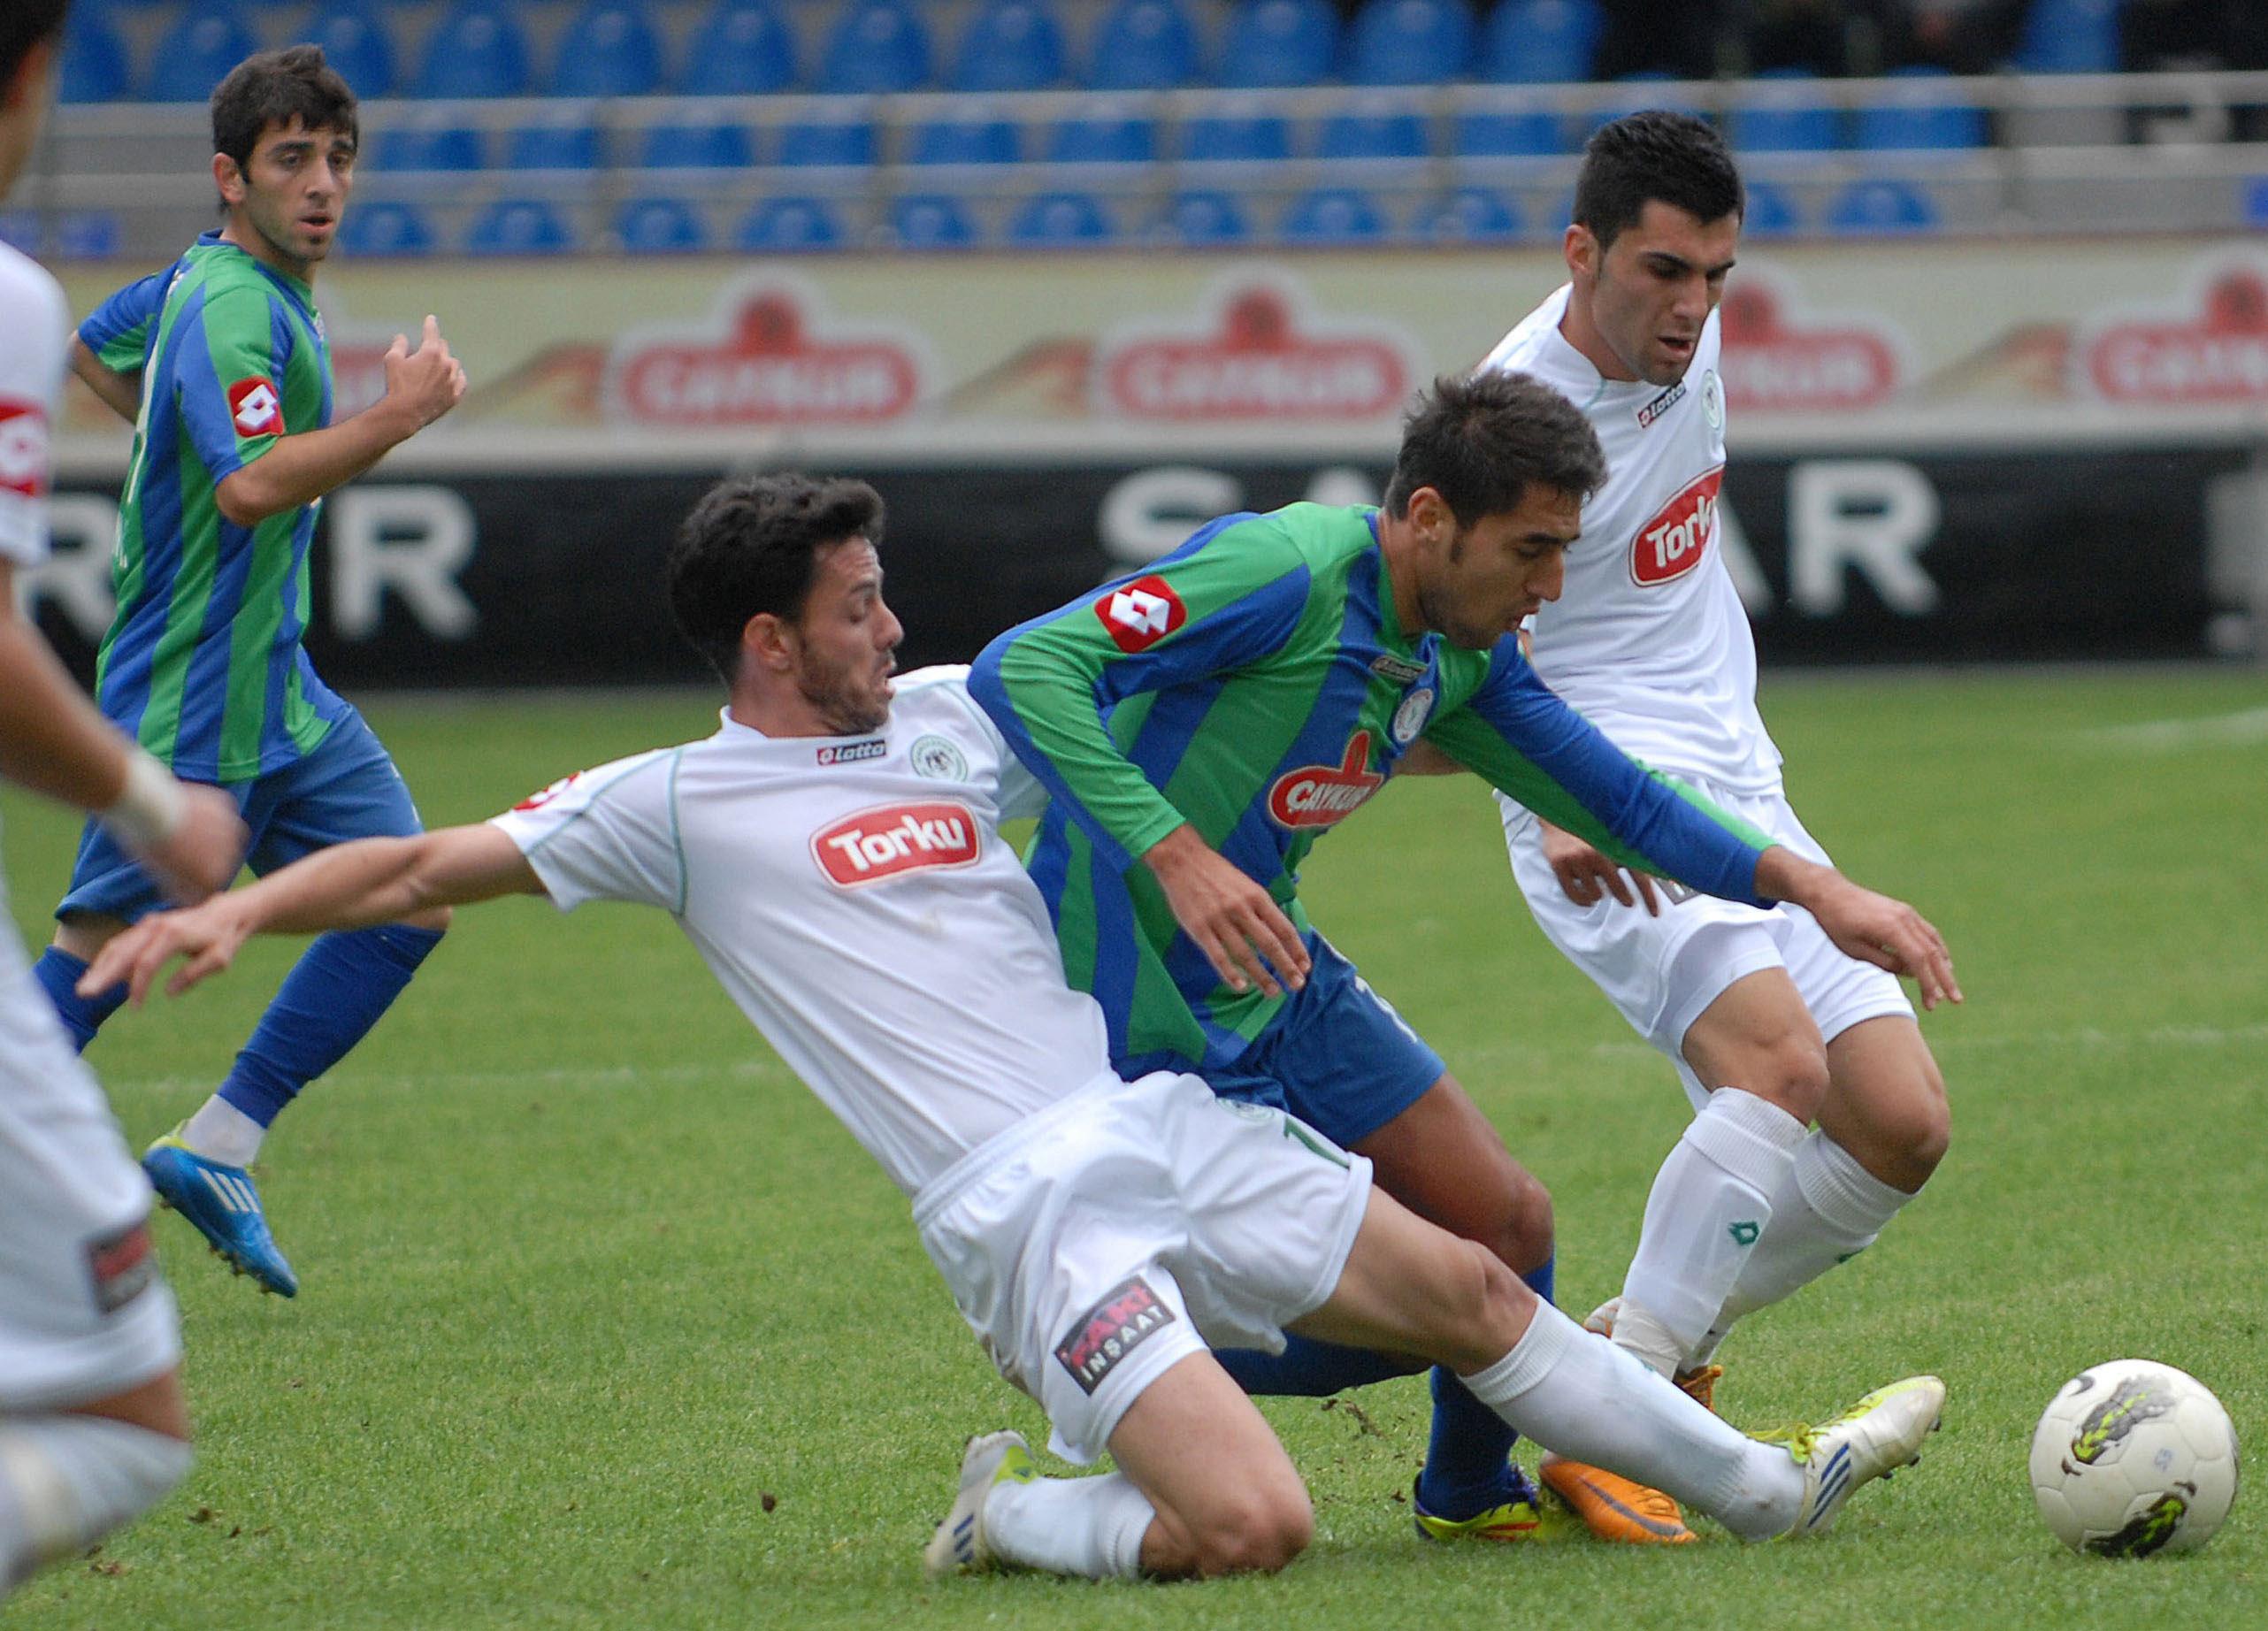 Çaykur Rizespor - Konyaspor 2-2  Sezon 2011-2012  galerisi resim 9